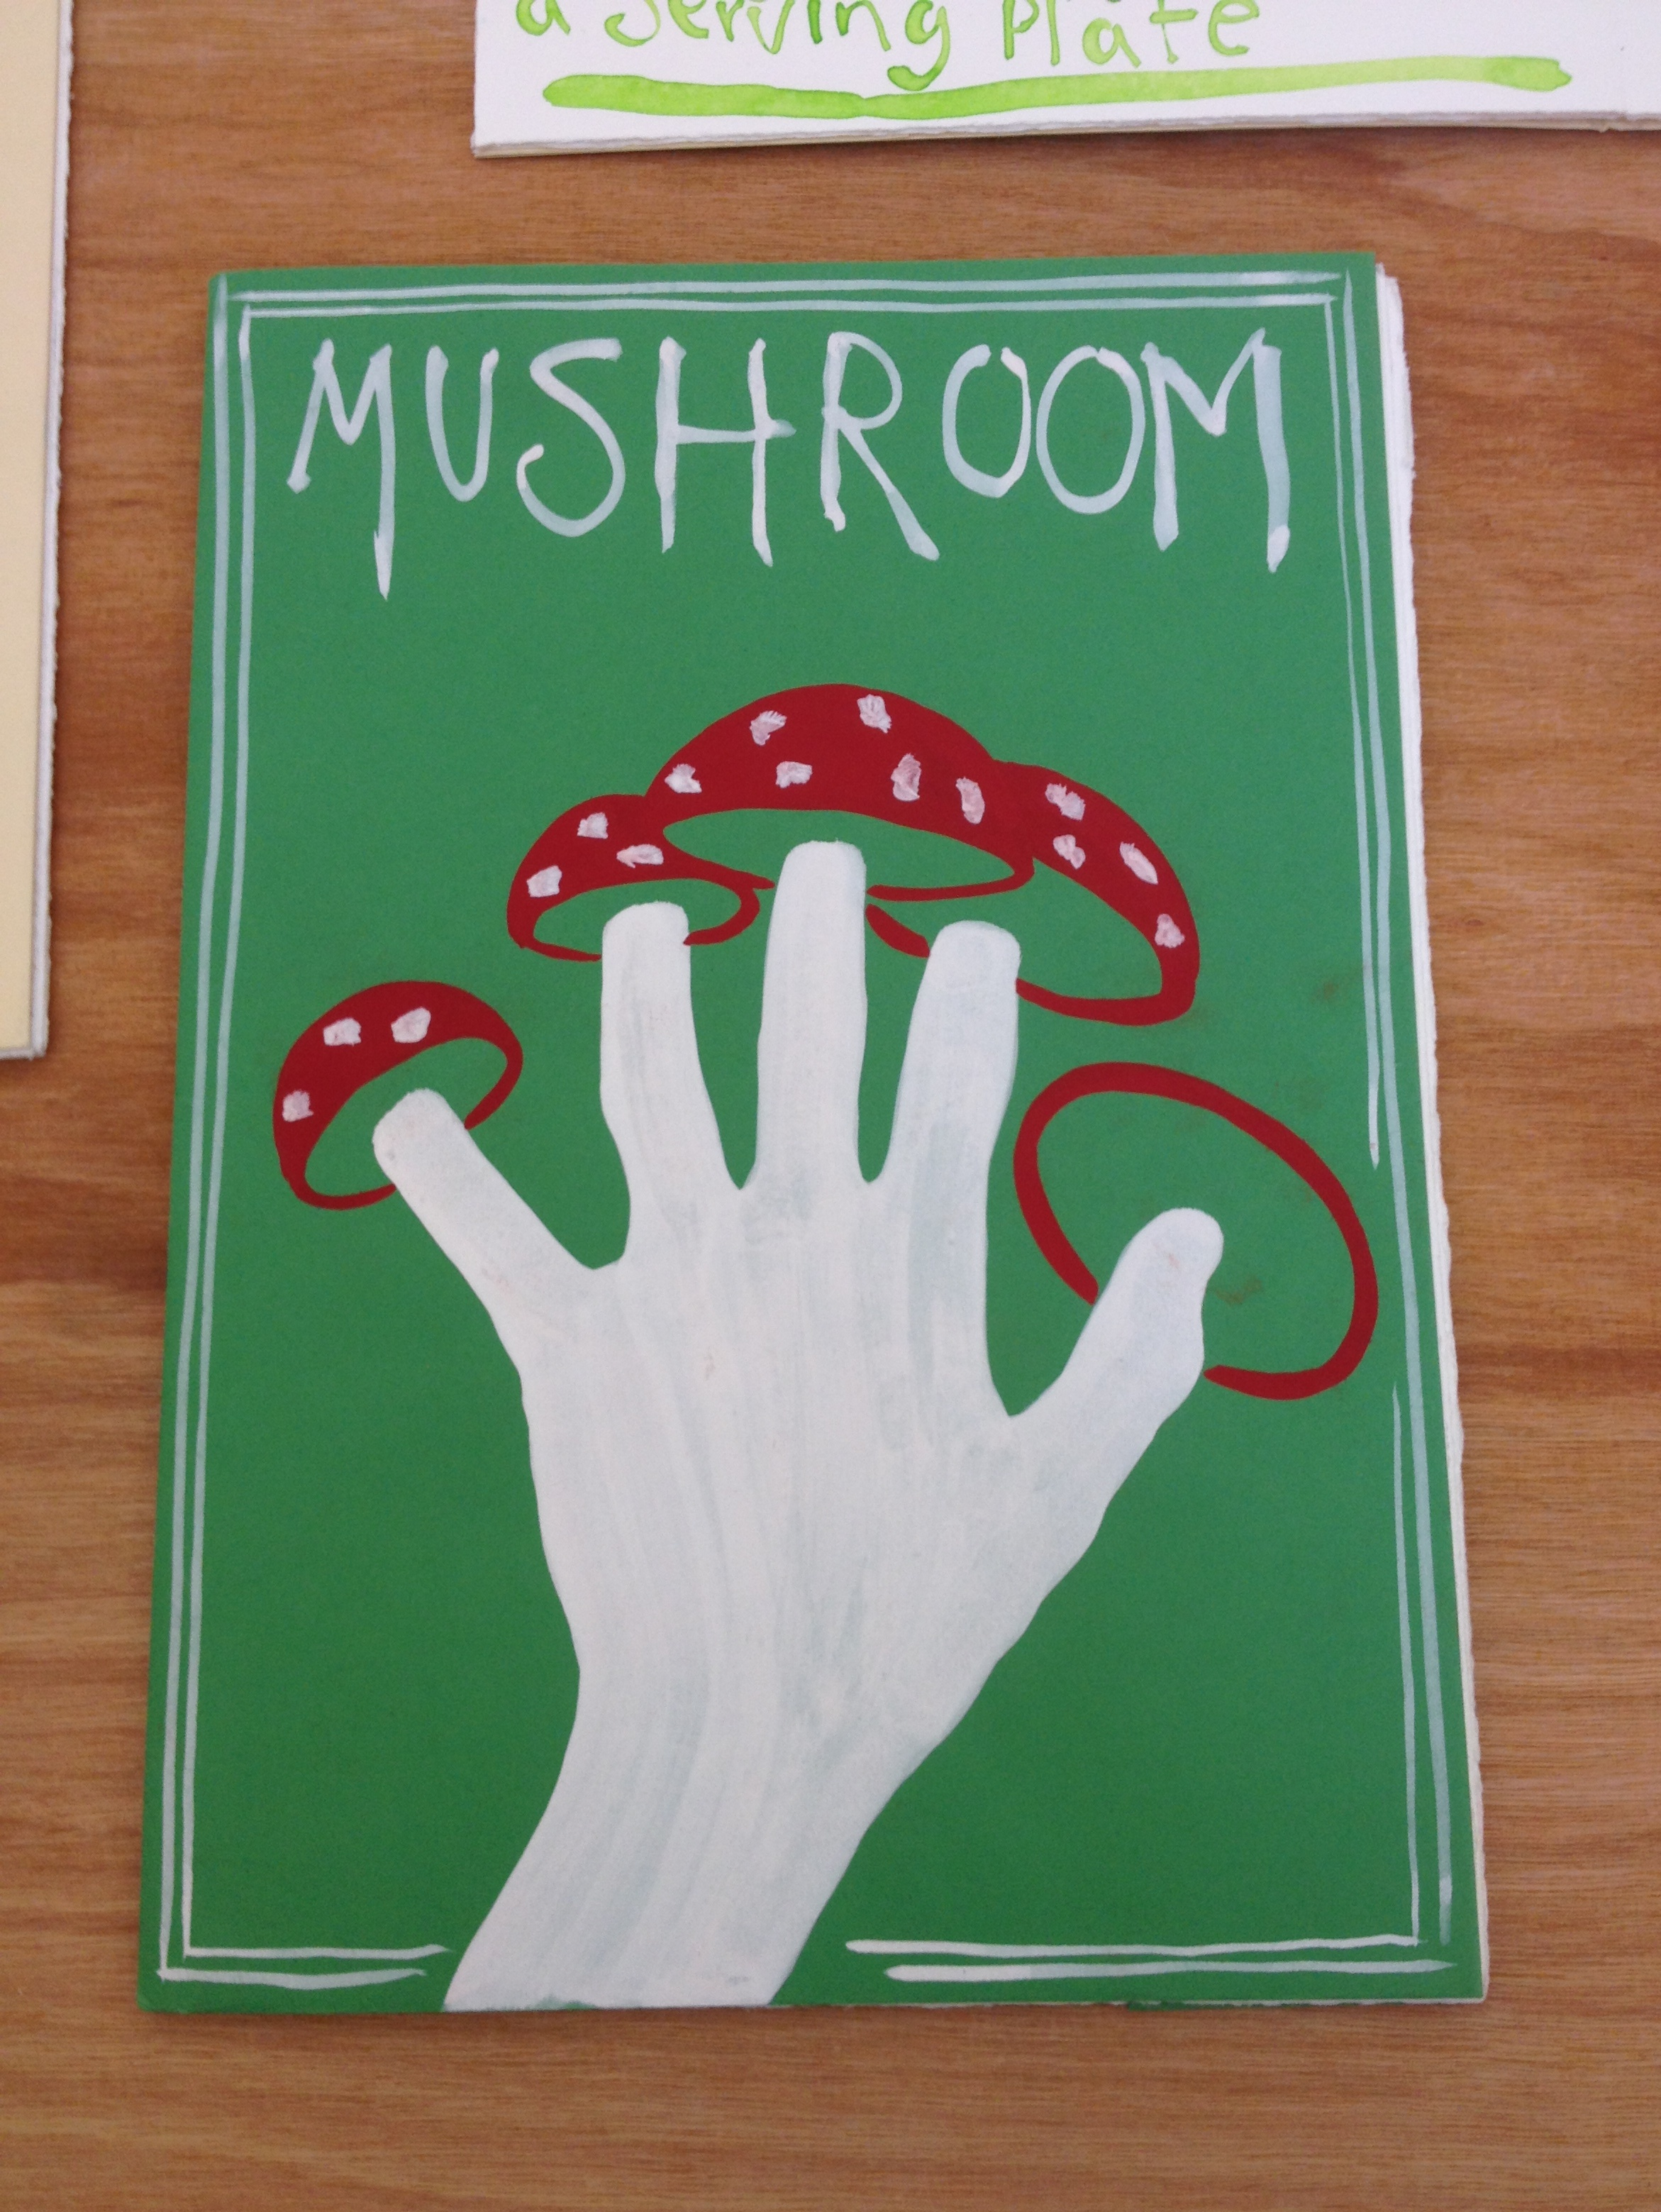 Mushroom - Greengrassi, Corvi-Mora - Kenningtonrunoff.com